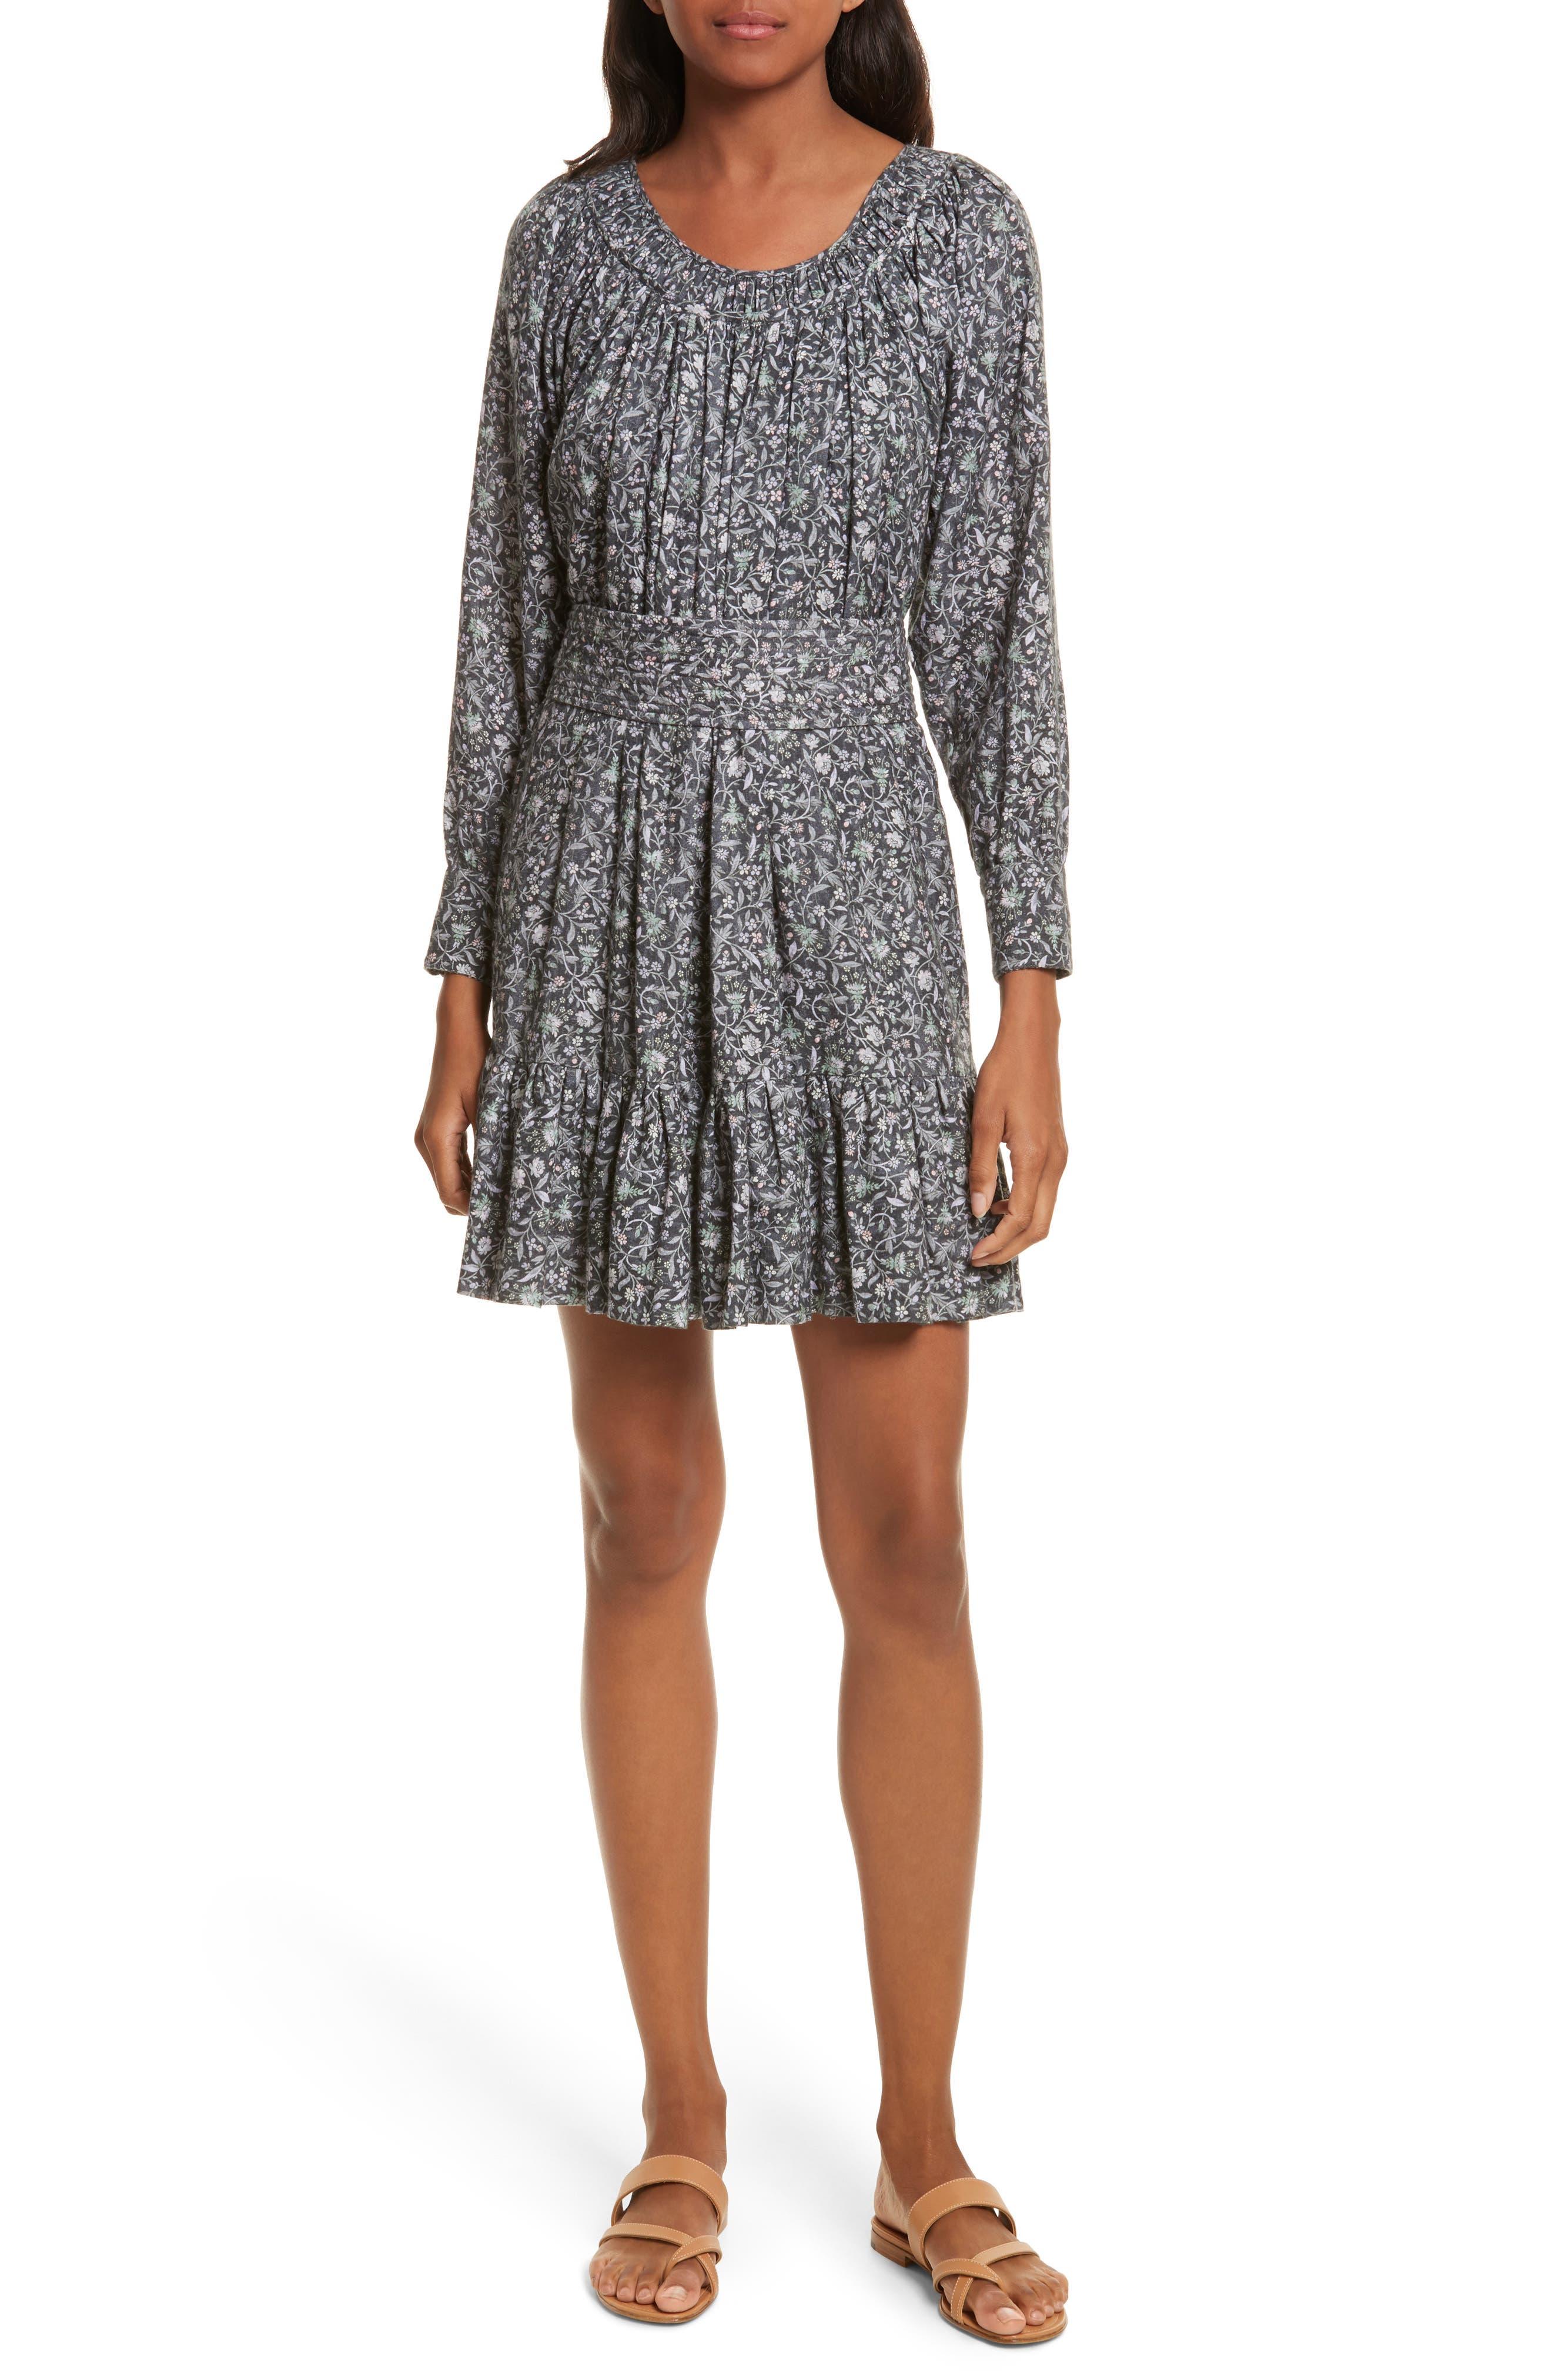 La Vie Rebecca Taylor Adeline Long Sleeve Dress